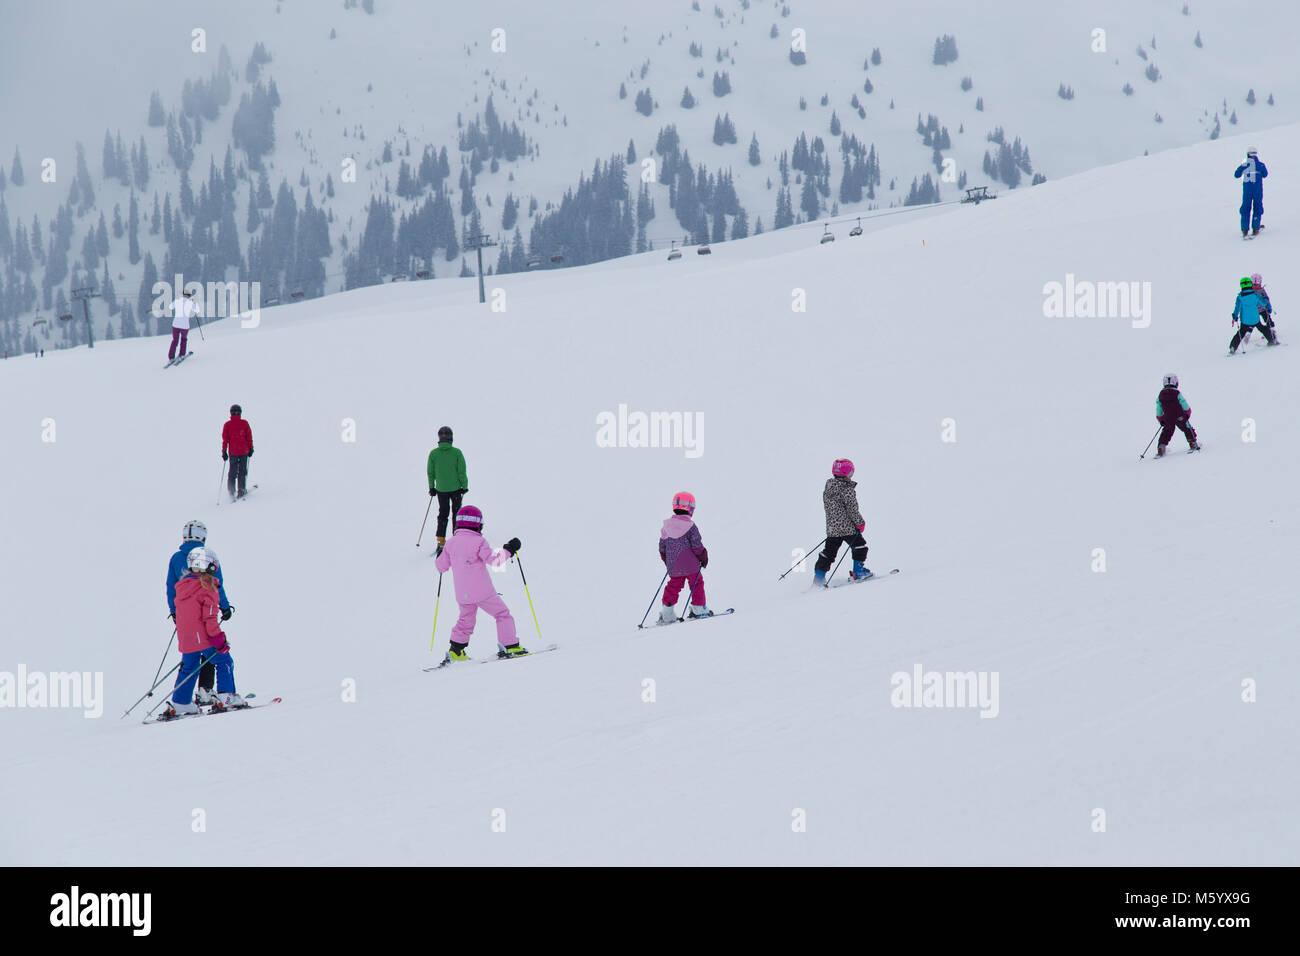 Ski school in Flims Switzerland - Stock Image